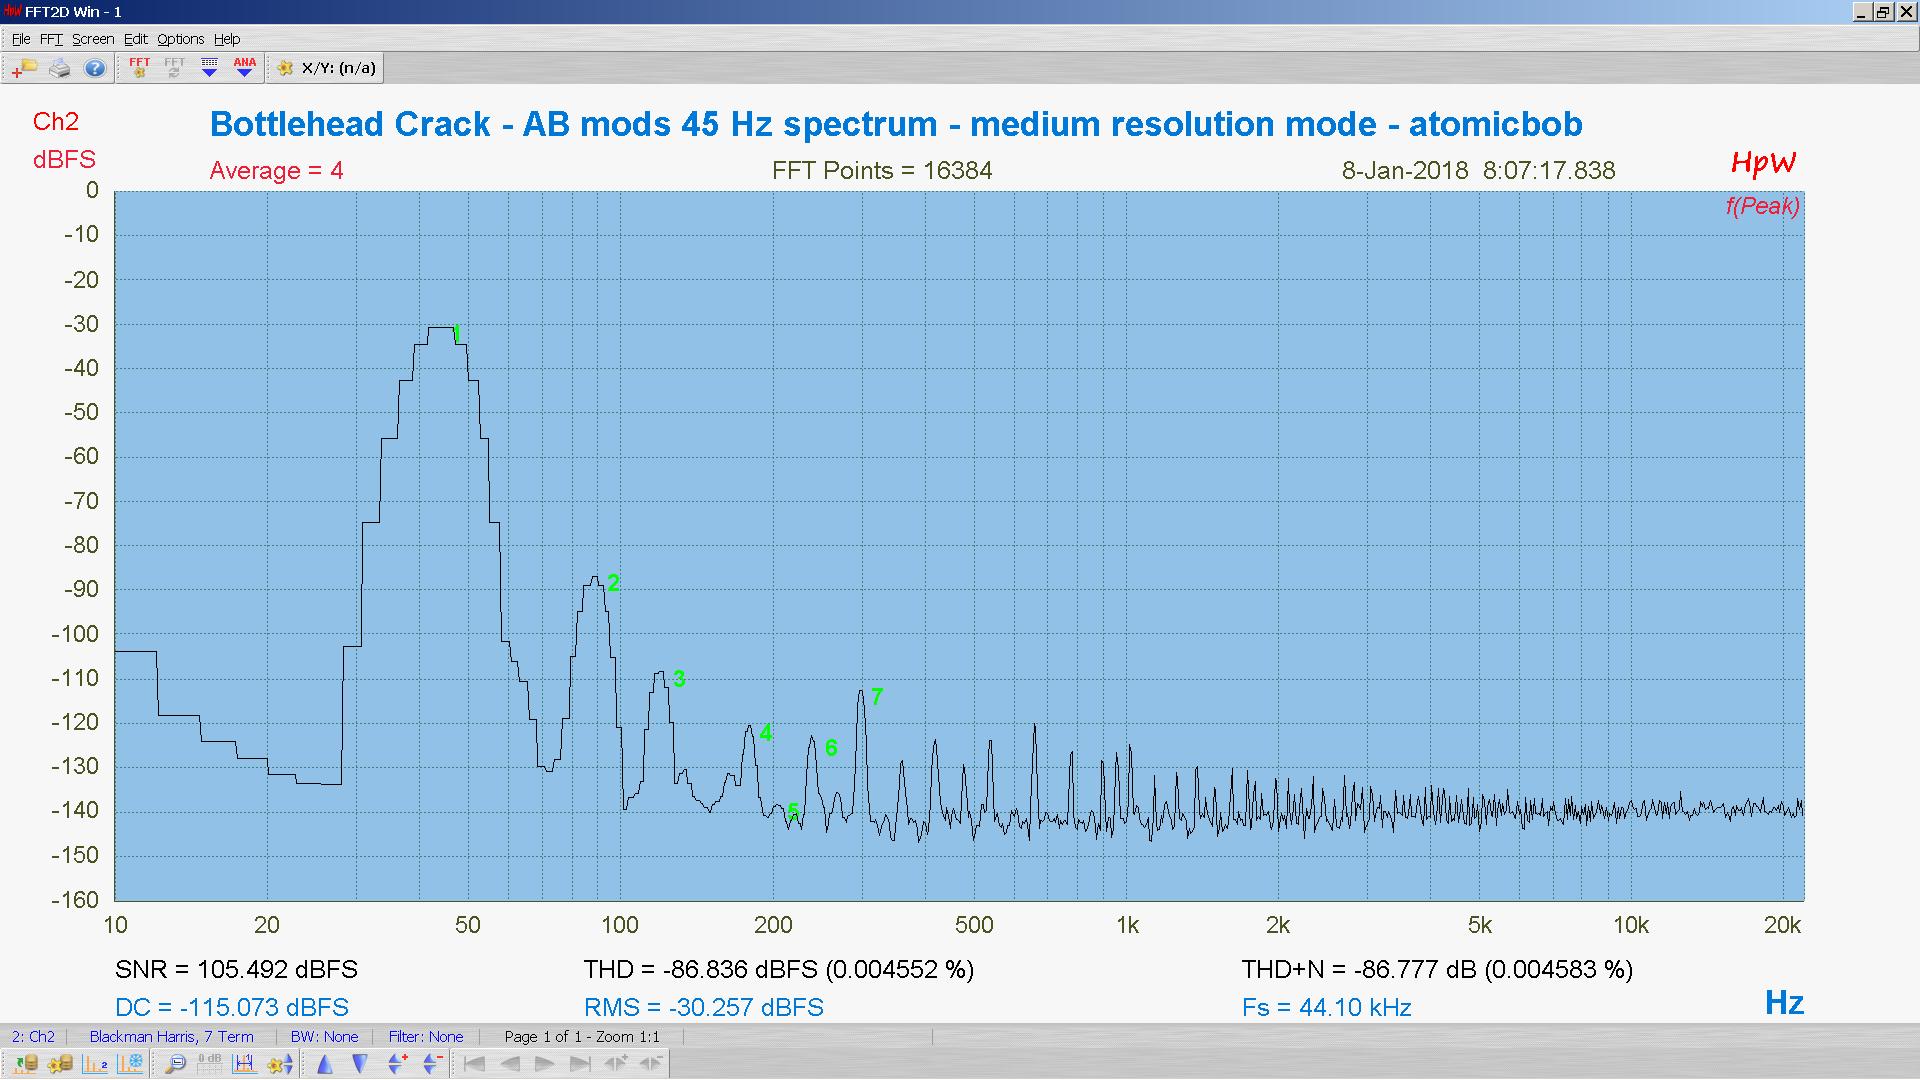 20180108-30 BH Crack e80cc 5998 45 Hz THD THD+N 16K FFT- ASIO -30 dBFS - HpW.PNG